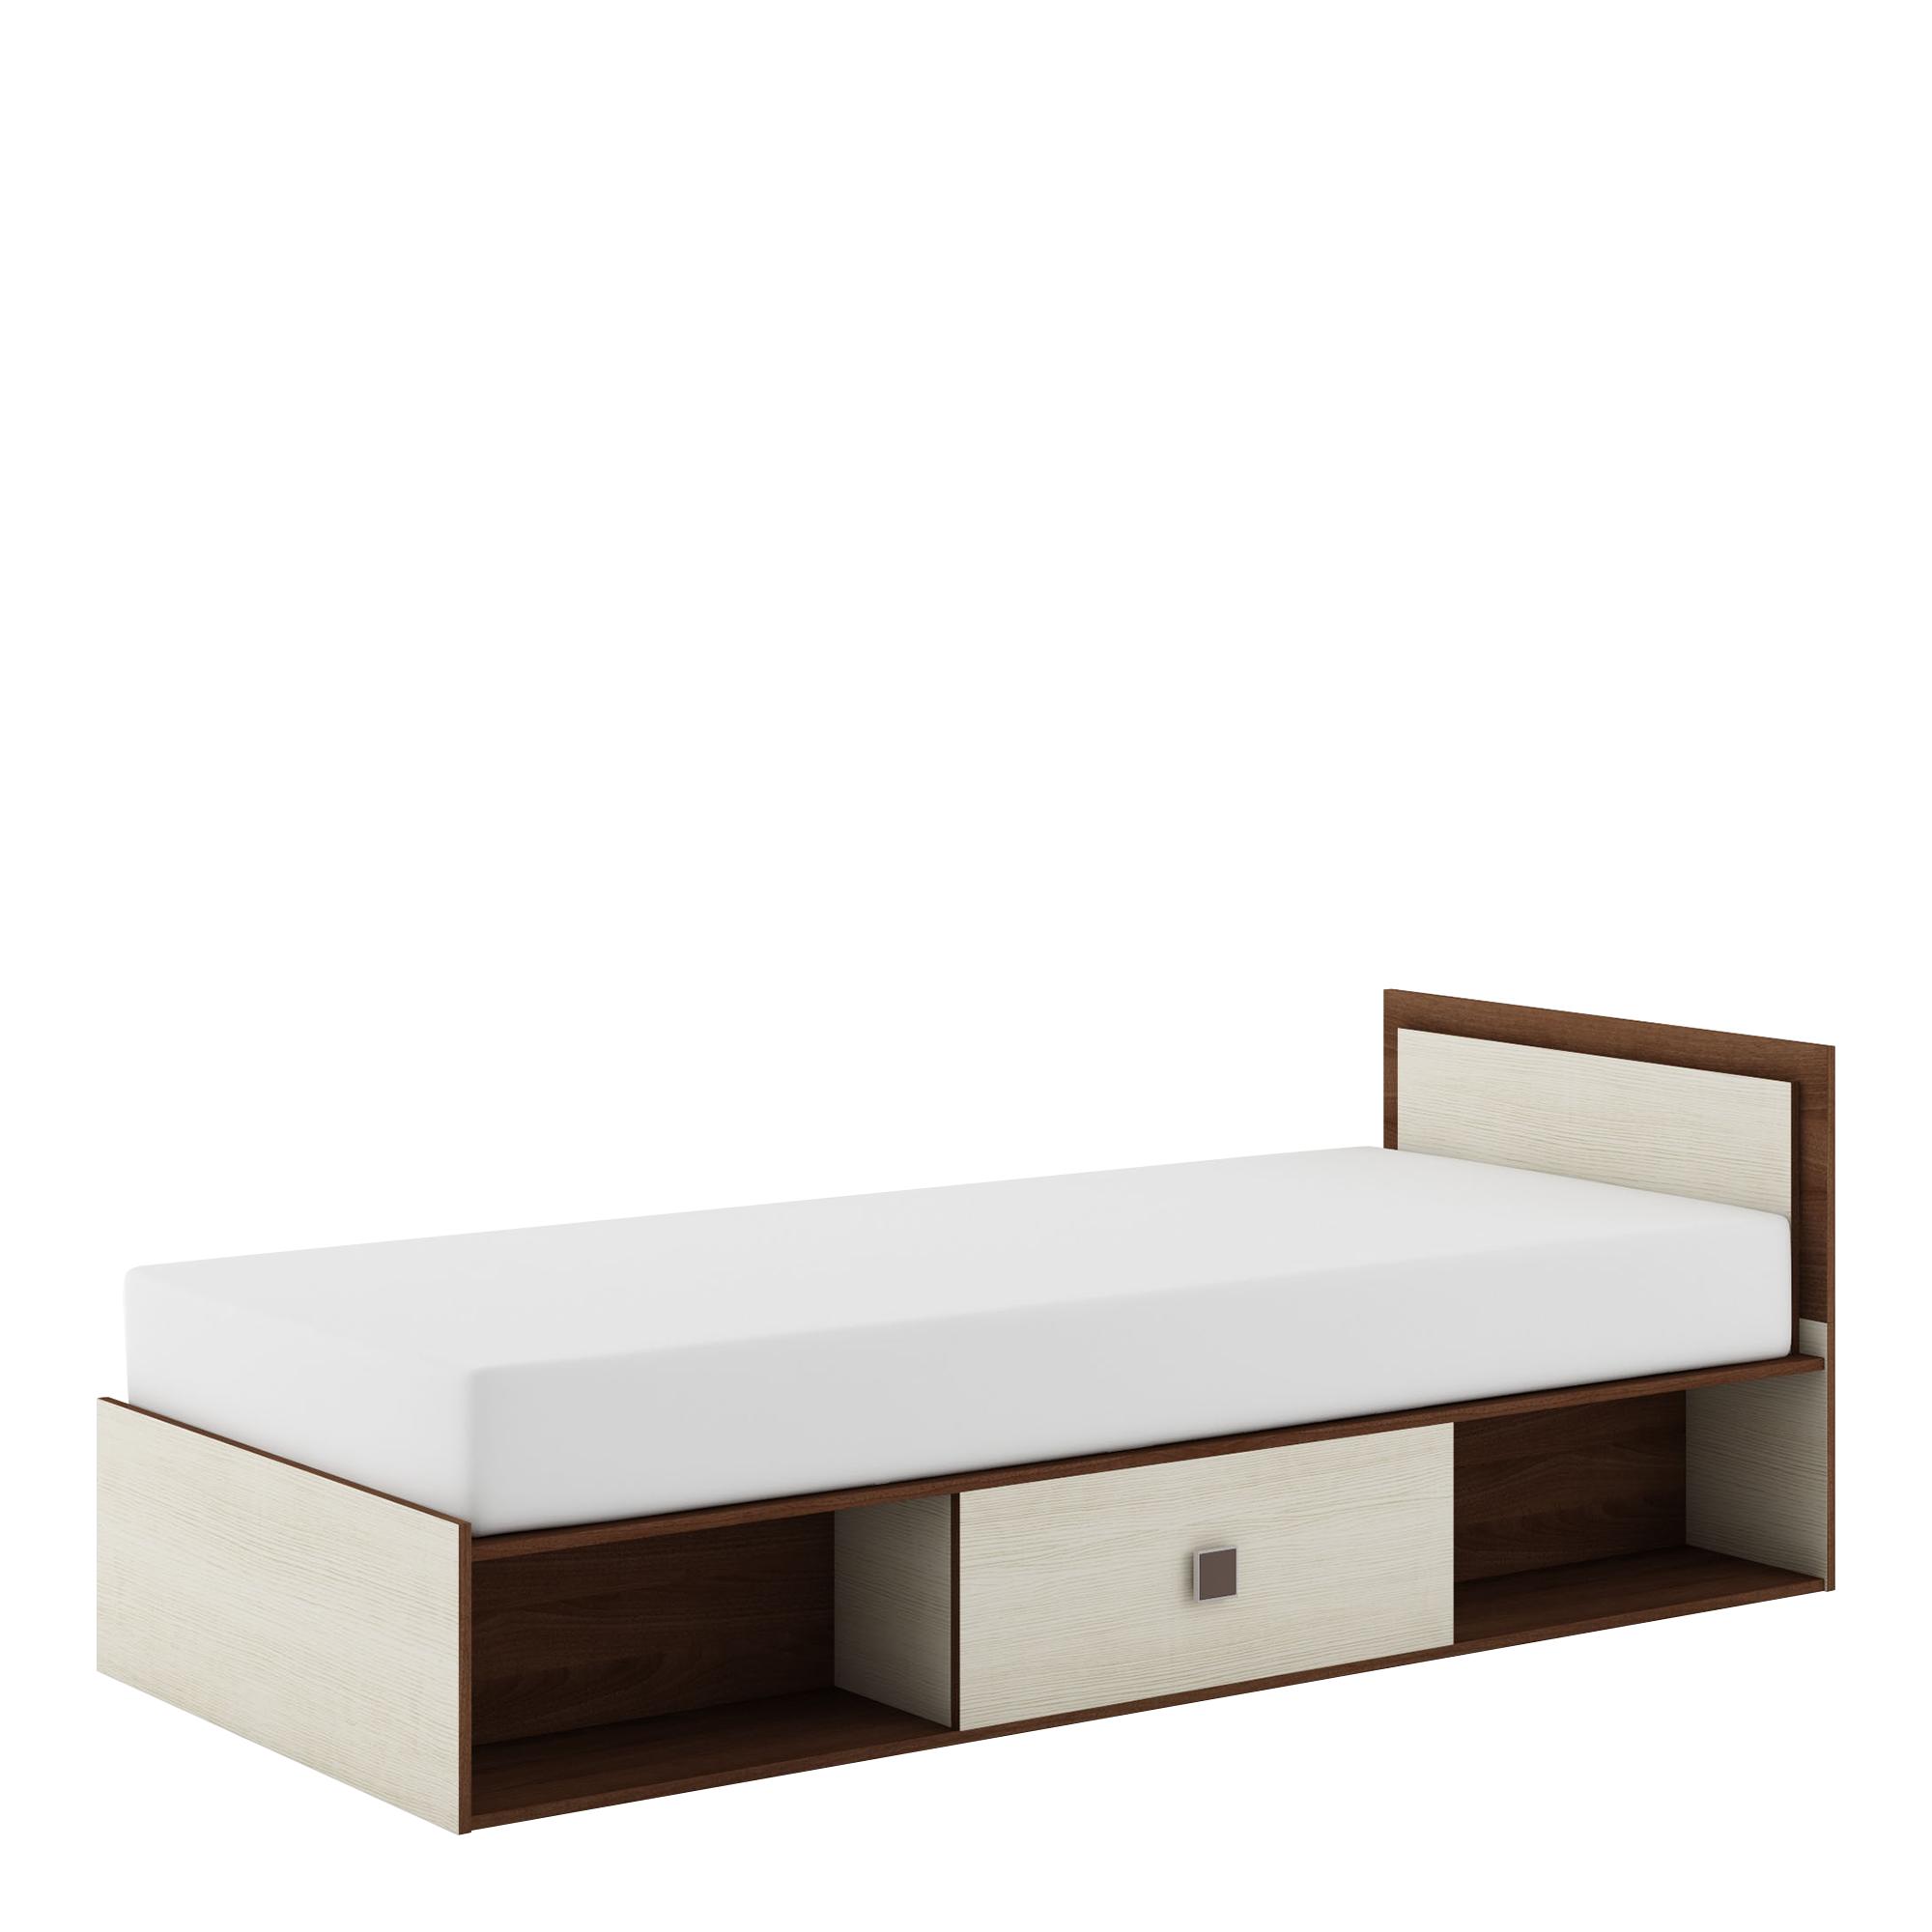 Majka łóżko Mm 16 Orzechkrem łóżka Salon Meblowy Agata